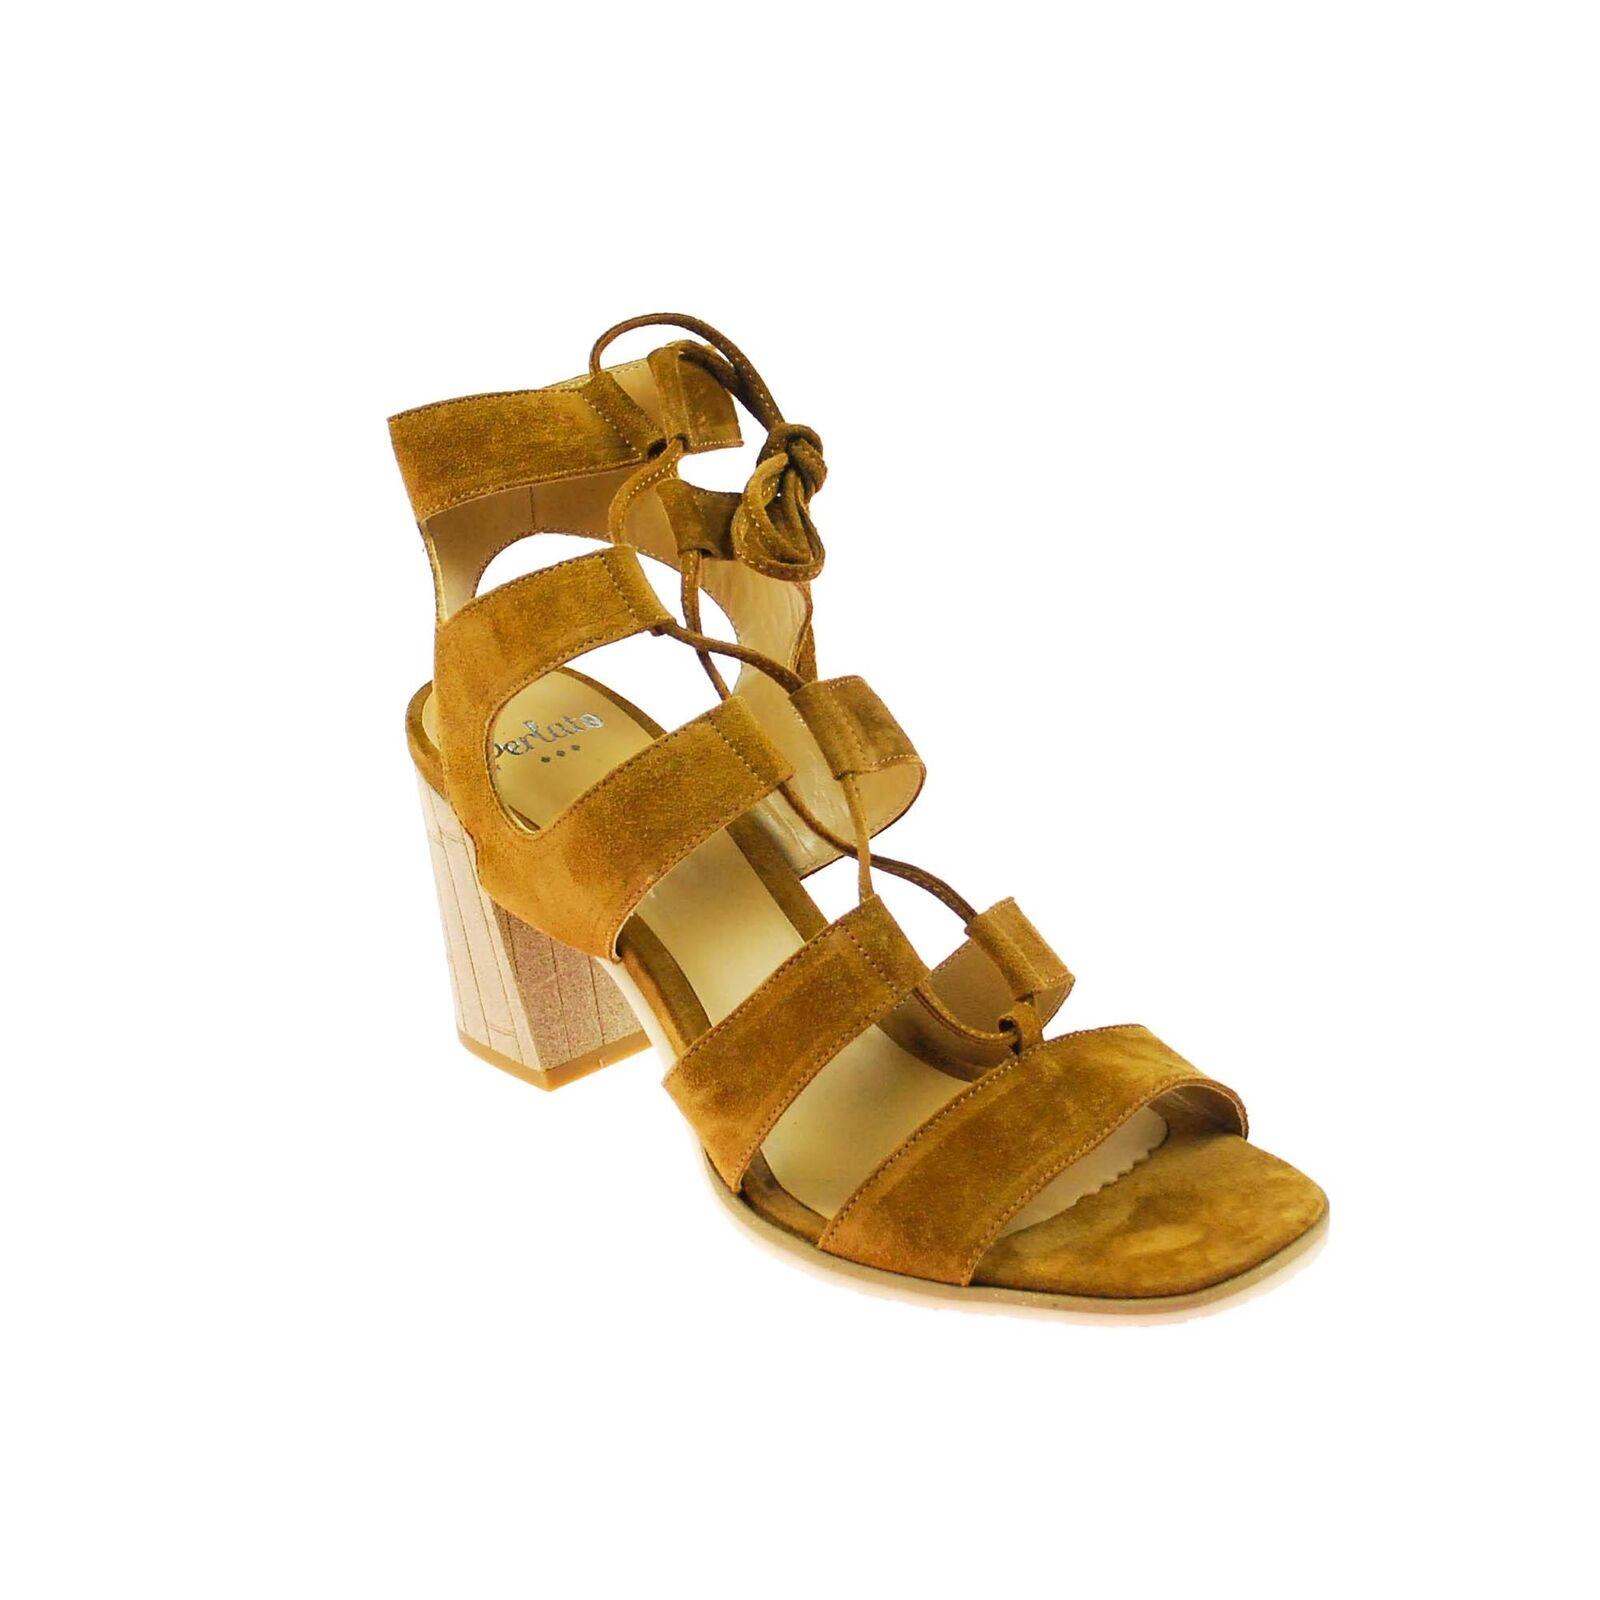 PERLATO Femmes Femmes PERLATO Escarpins  s Chaussure Cuir Marron 5a6156